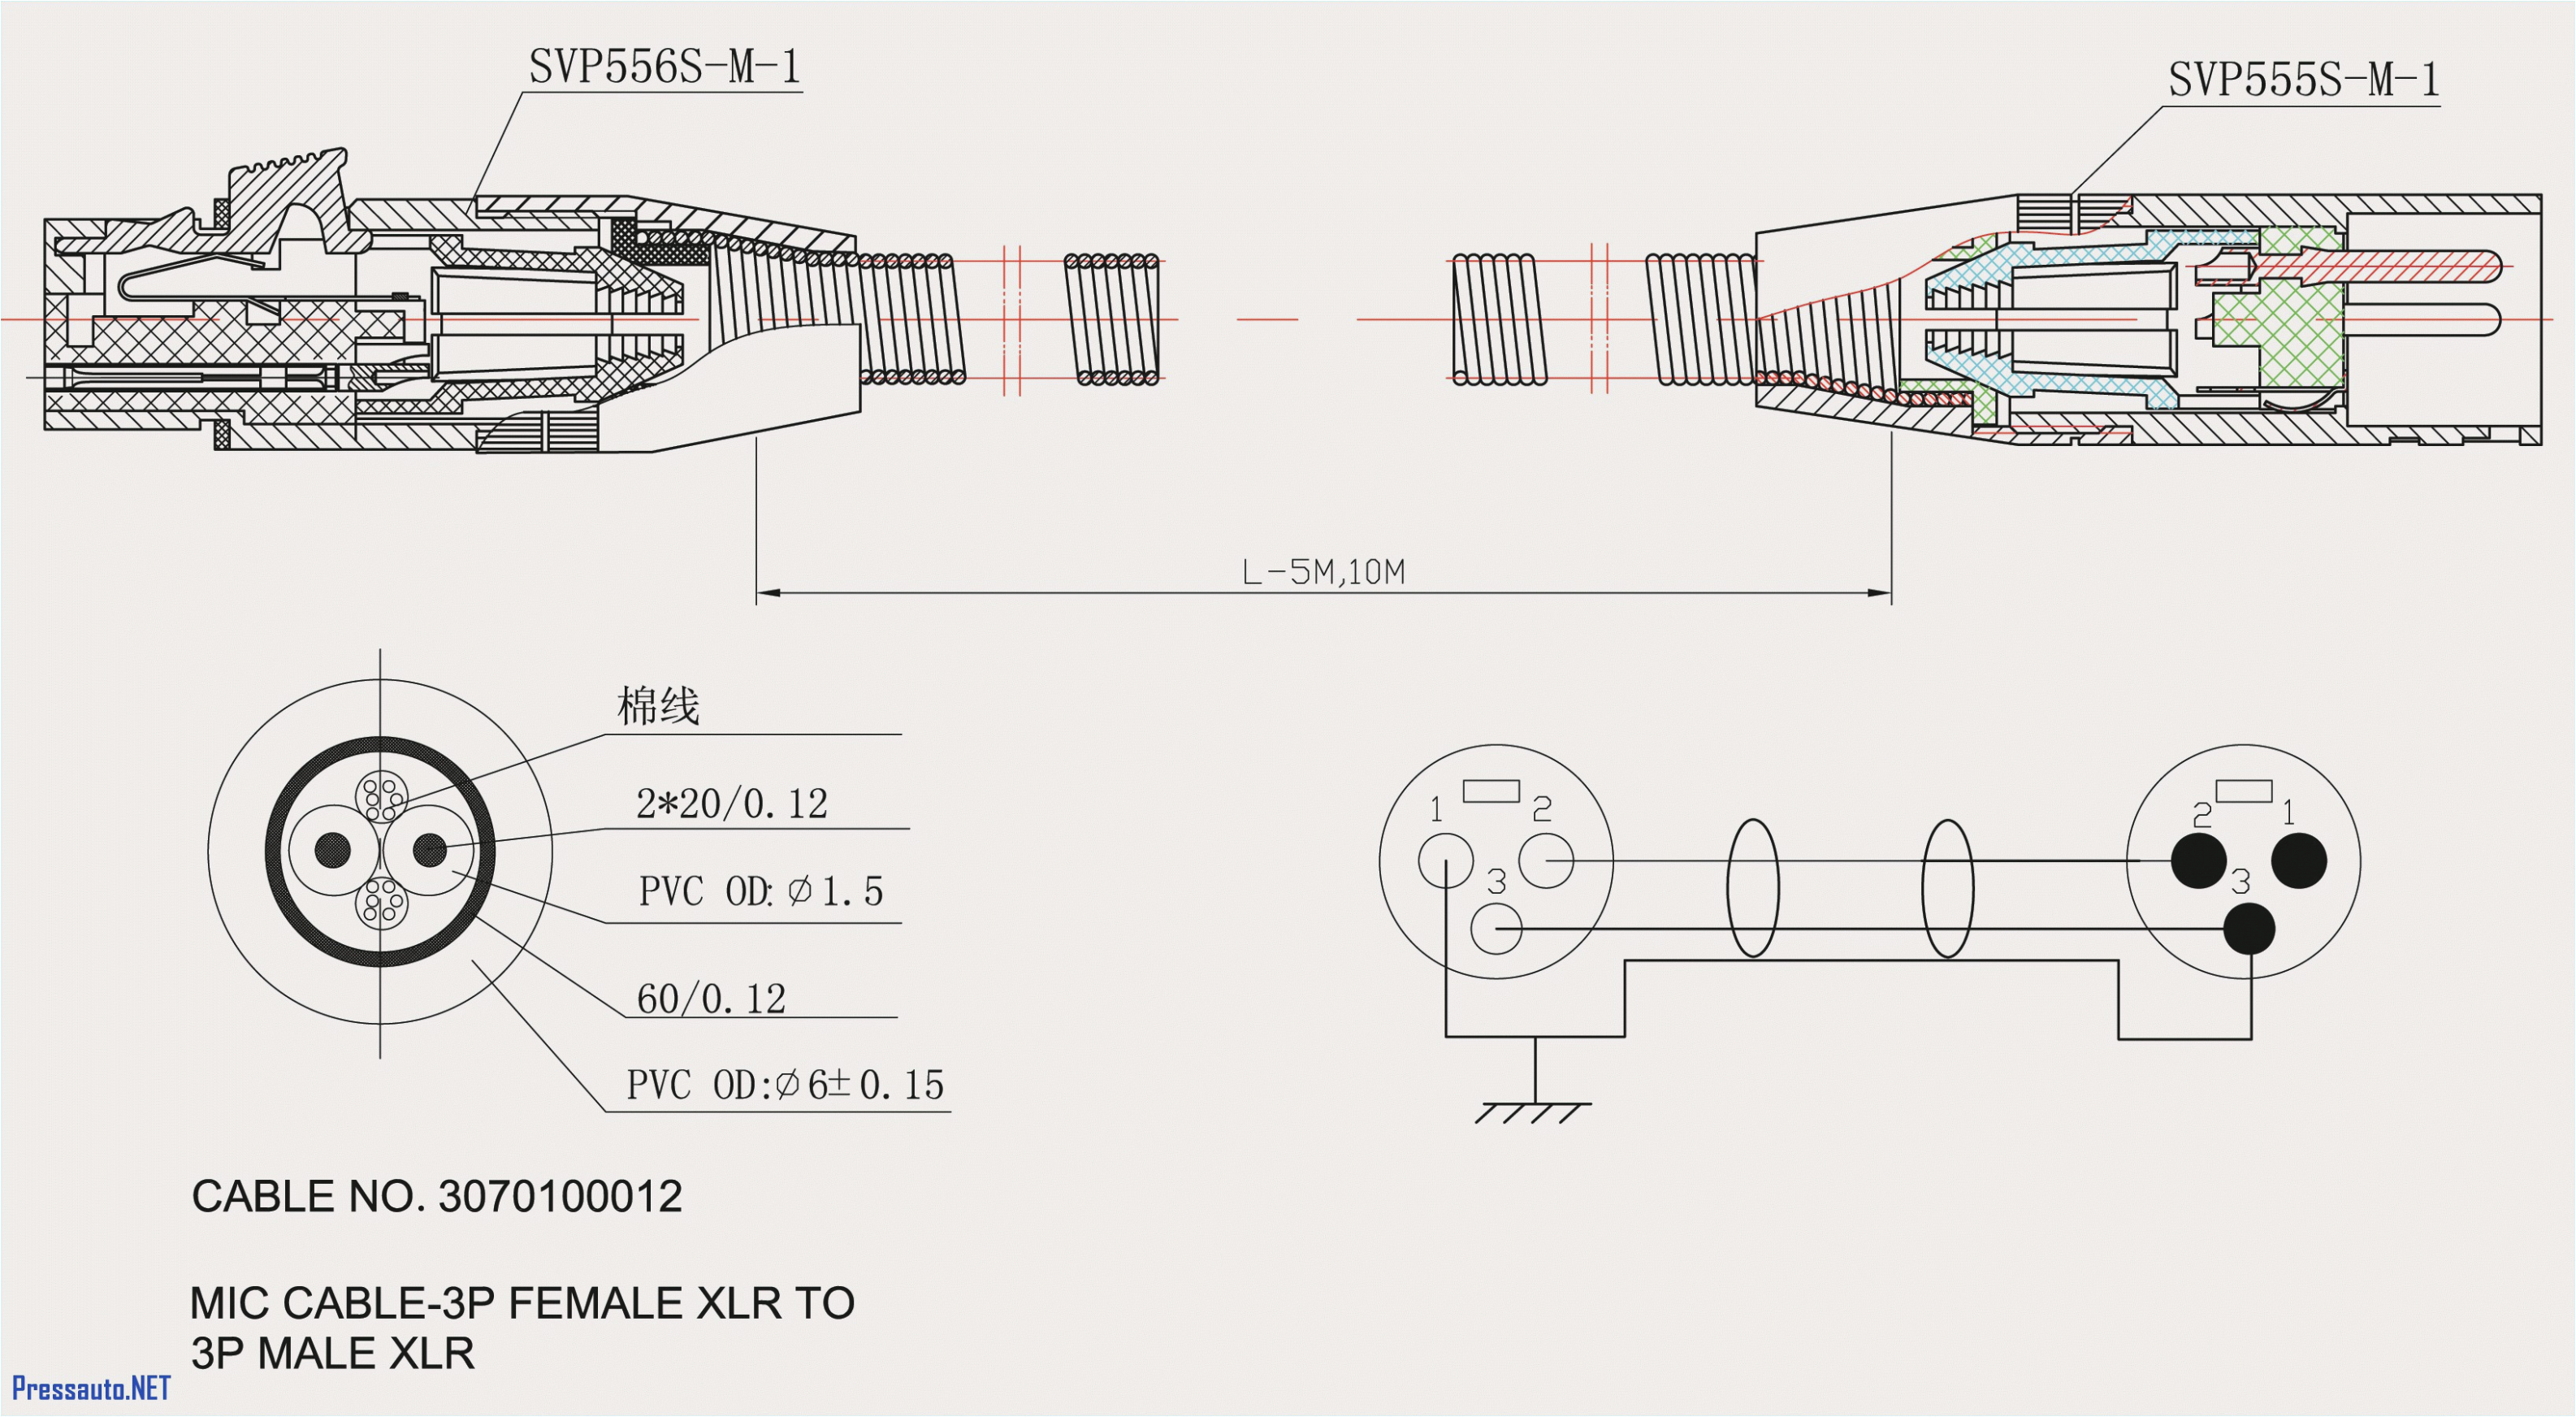 wiring clark diagram cgp55 wiring diagram paper wiring clark diagram cgp55